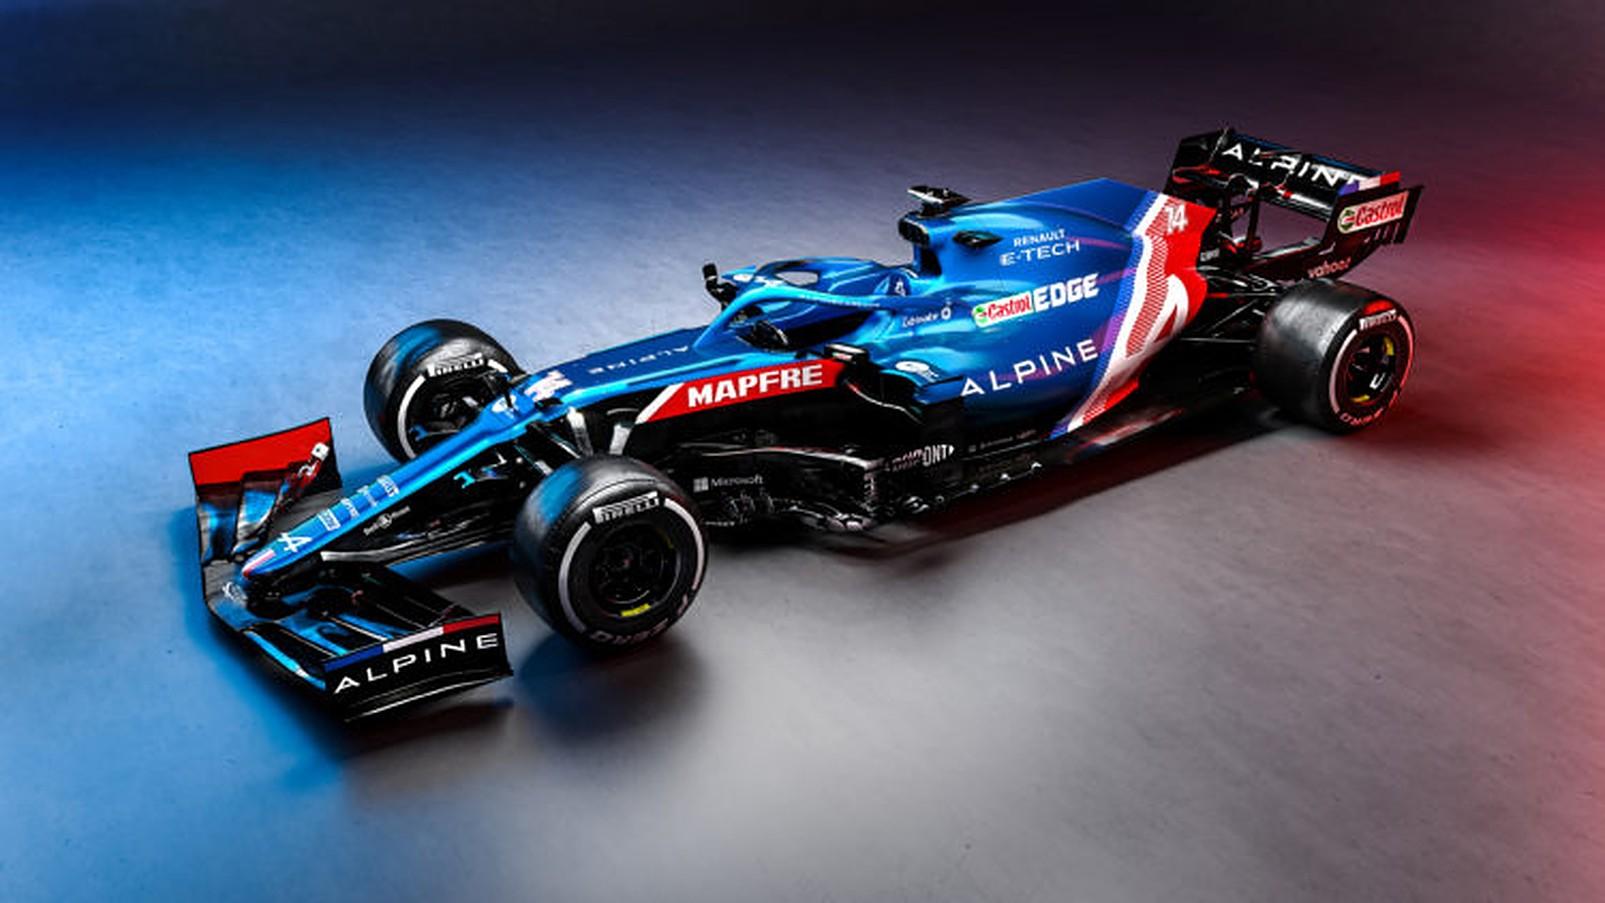 Alpine's 2021 Car